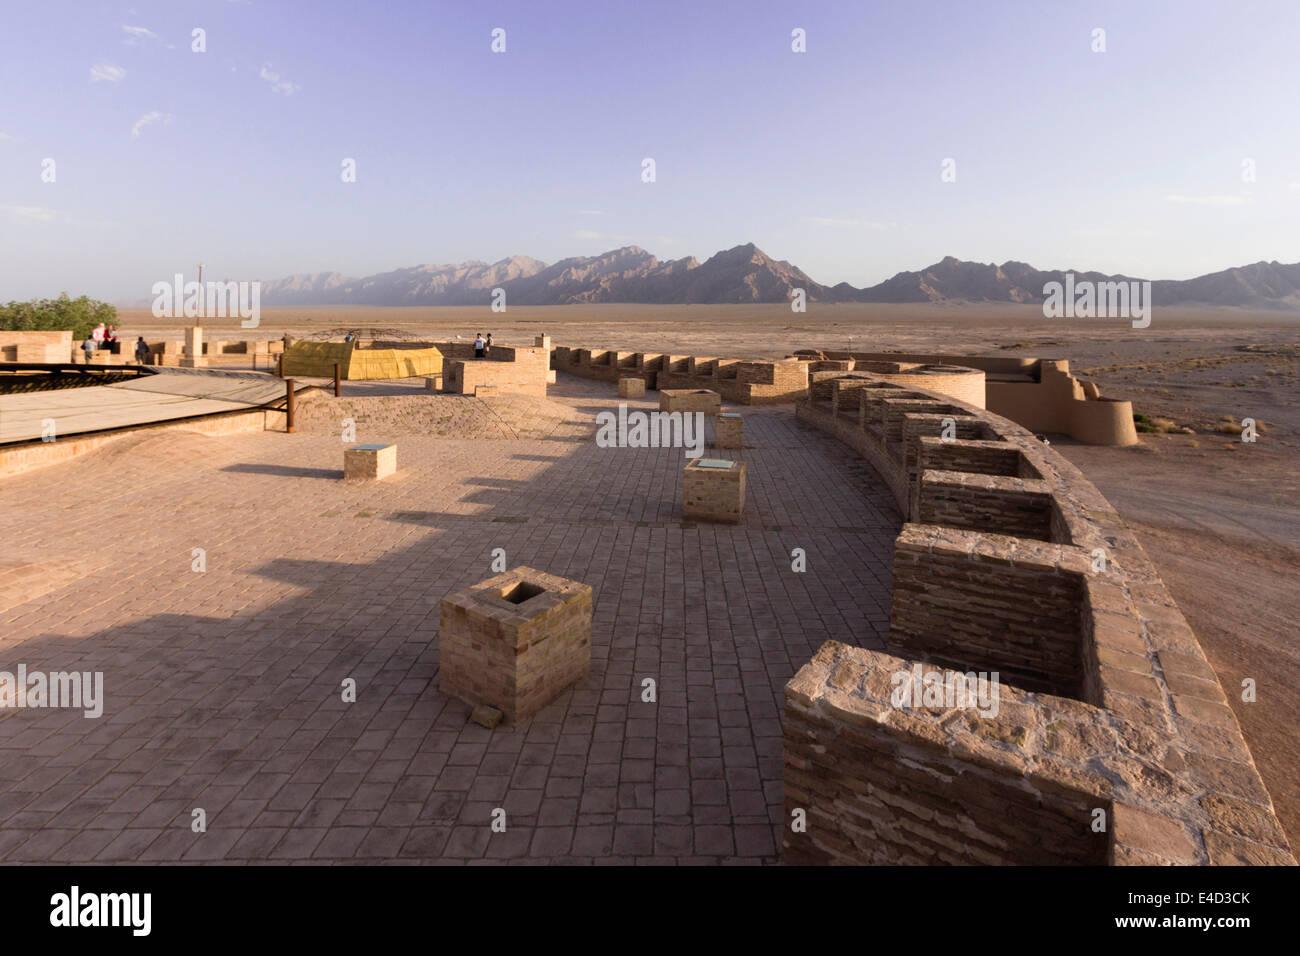 Robat-e Zayn al-Din Caravanserai, built by the Safavid government of Kerman on the Silk Road, Yazd, Iran - Stock Image